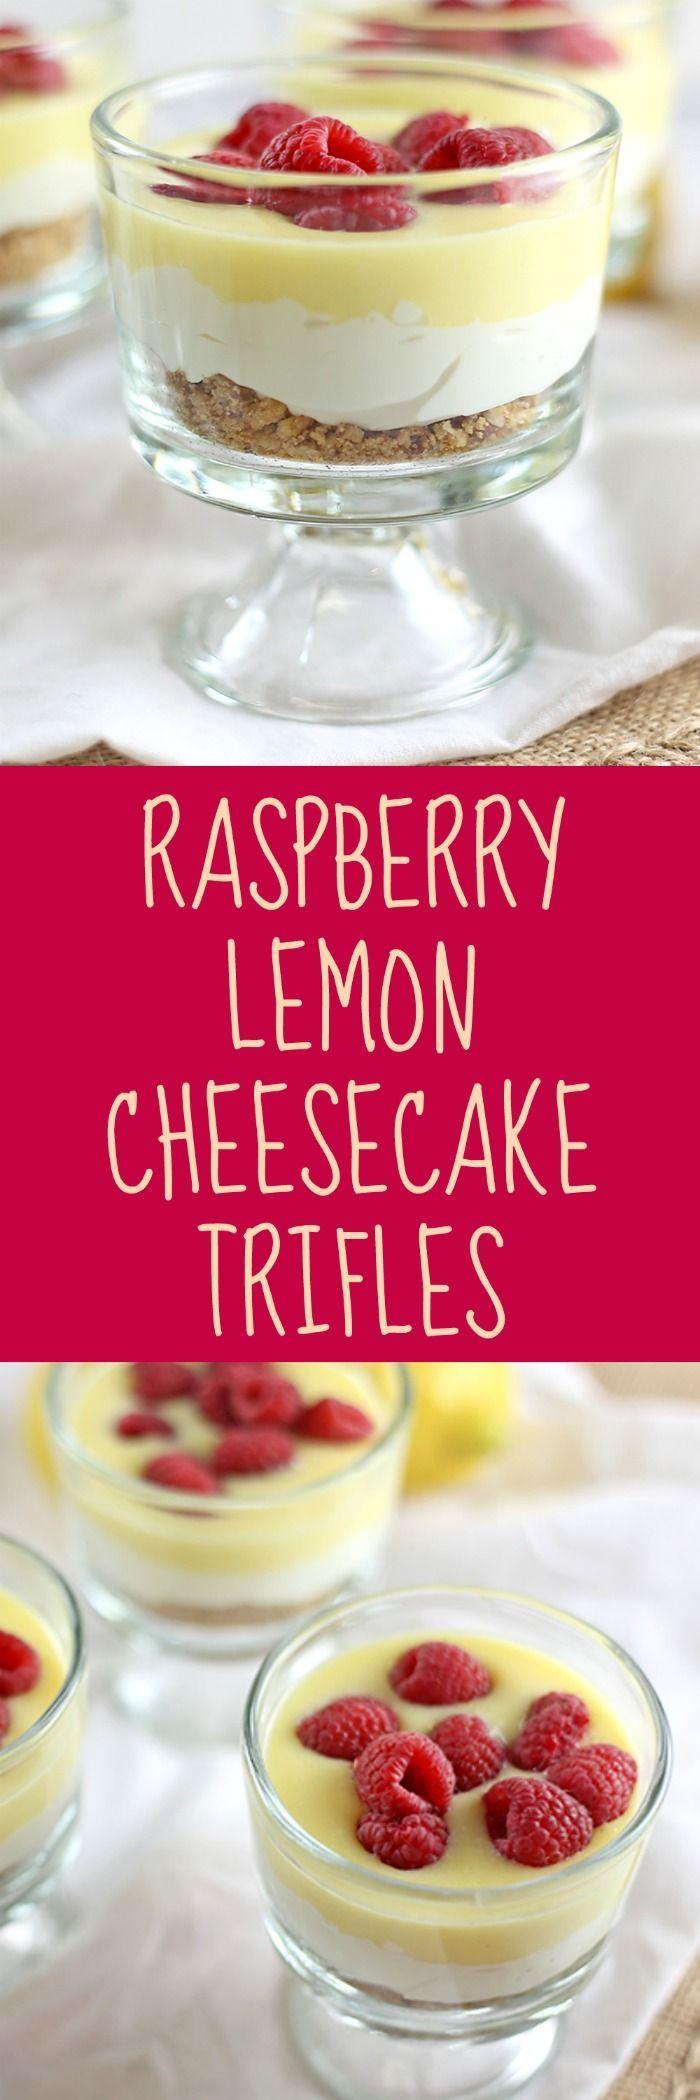 Raspberry Lemon Cheesecake Trifles - Rose Bakes